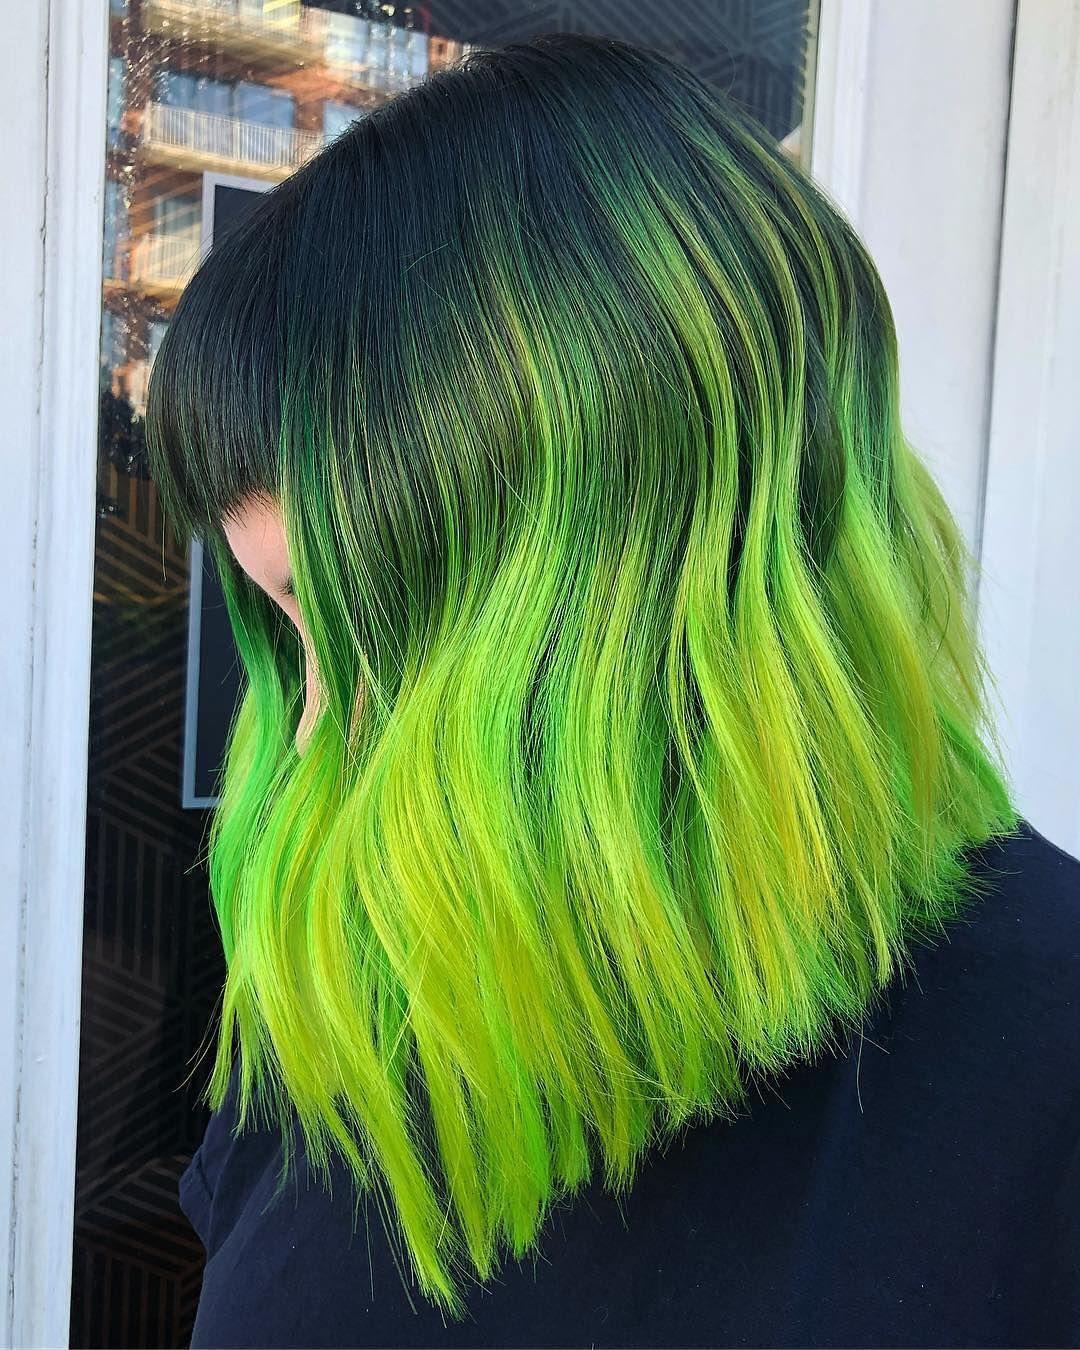 Slime Babe Ciarasikes Pravanavivids Pravananeons Greenhair Neonhair Neon Green Hair Green Hair Ombre Hair Inspo Color